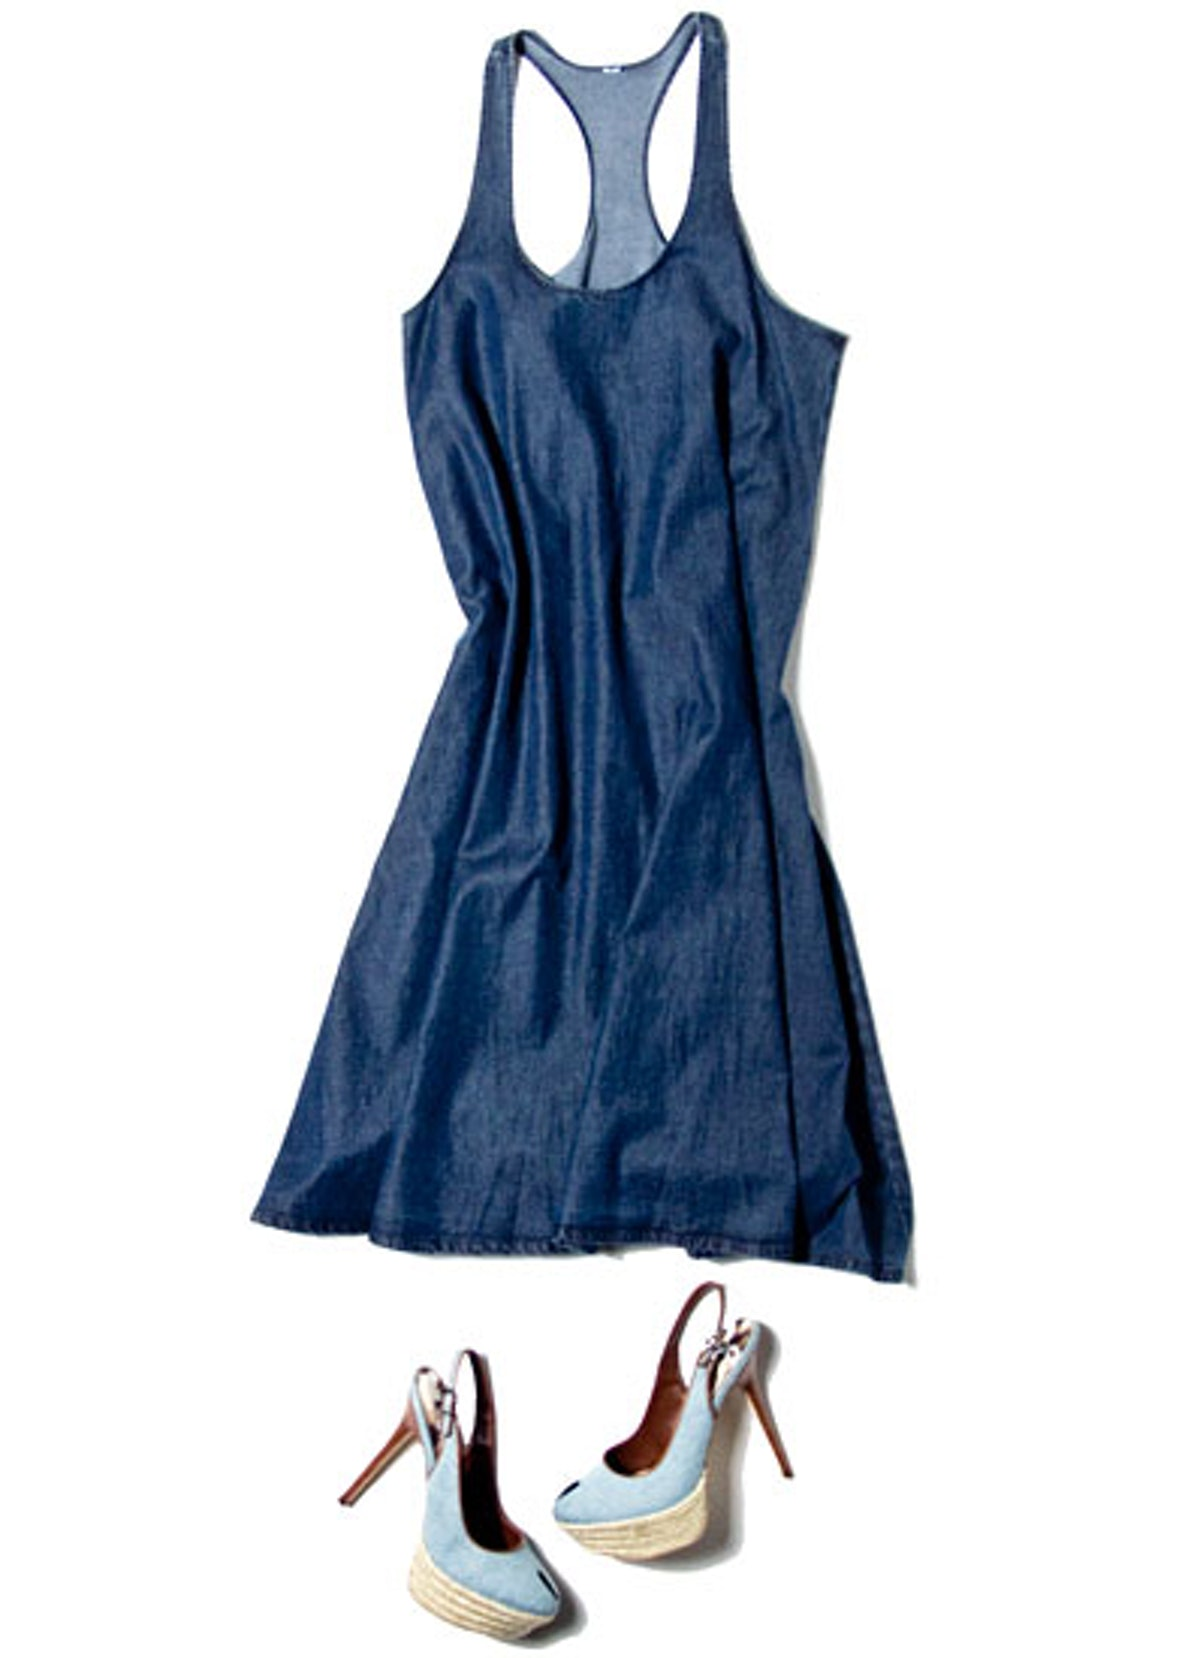 fass-spring-fashion-trends-01-v.jpg